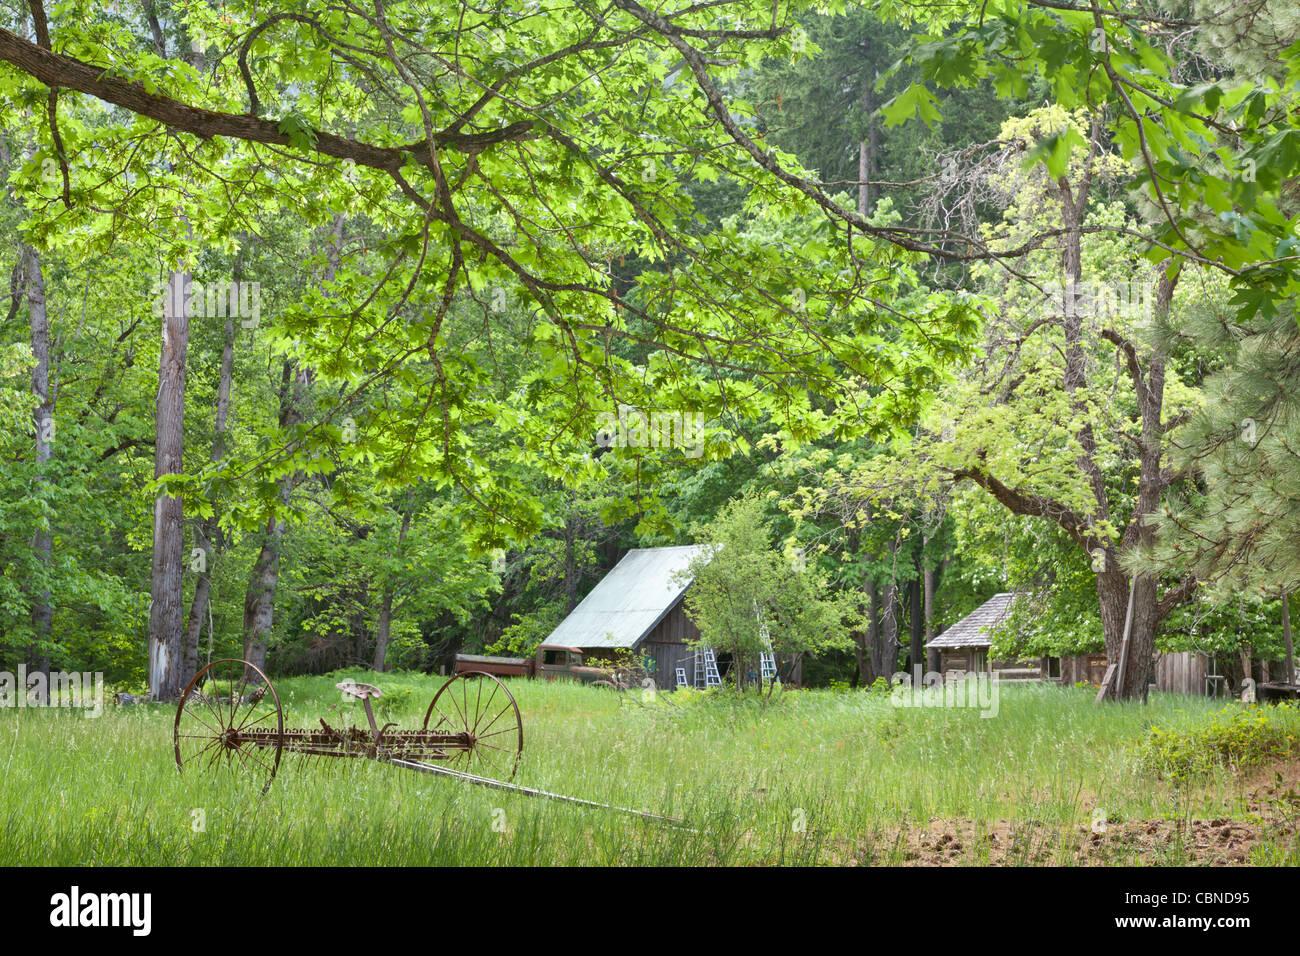 Historic Buckner Orchard and Homestead North Cascades National Park, Washington - Stock Image